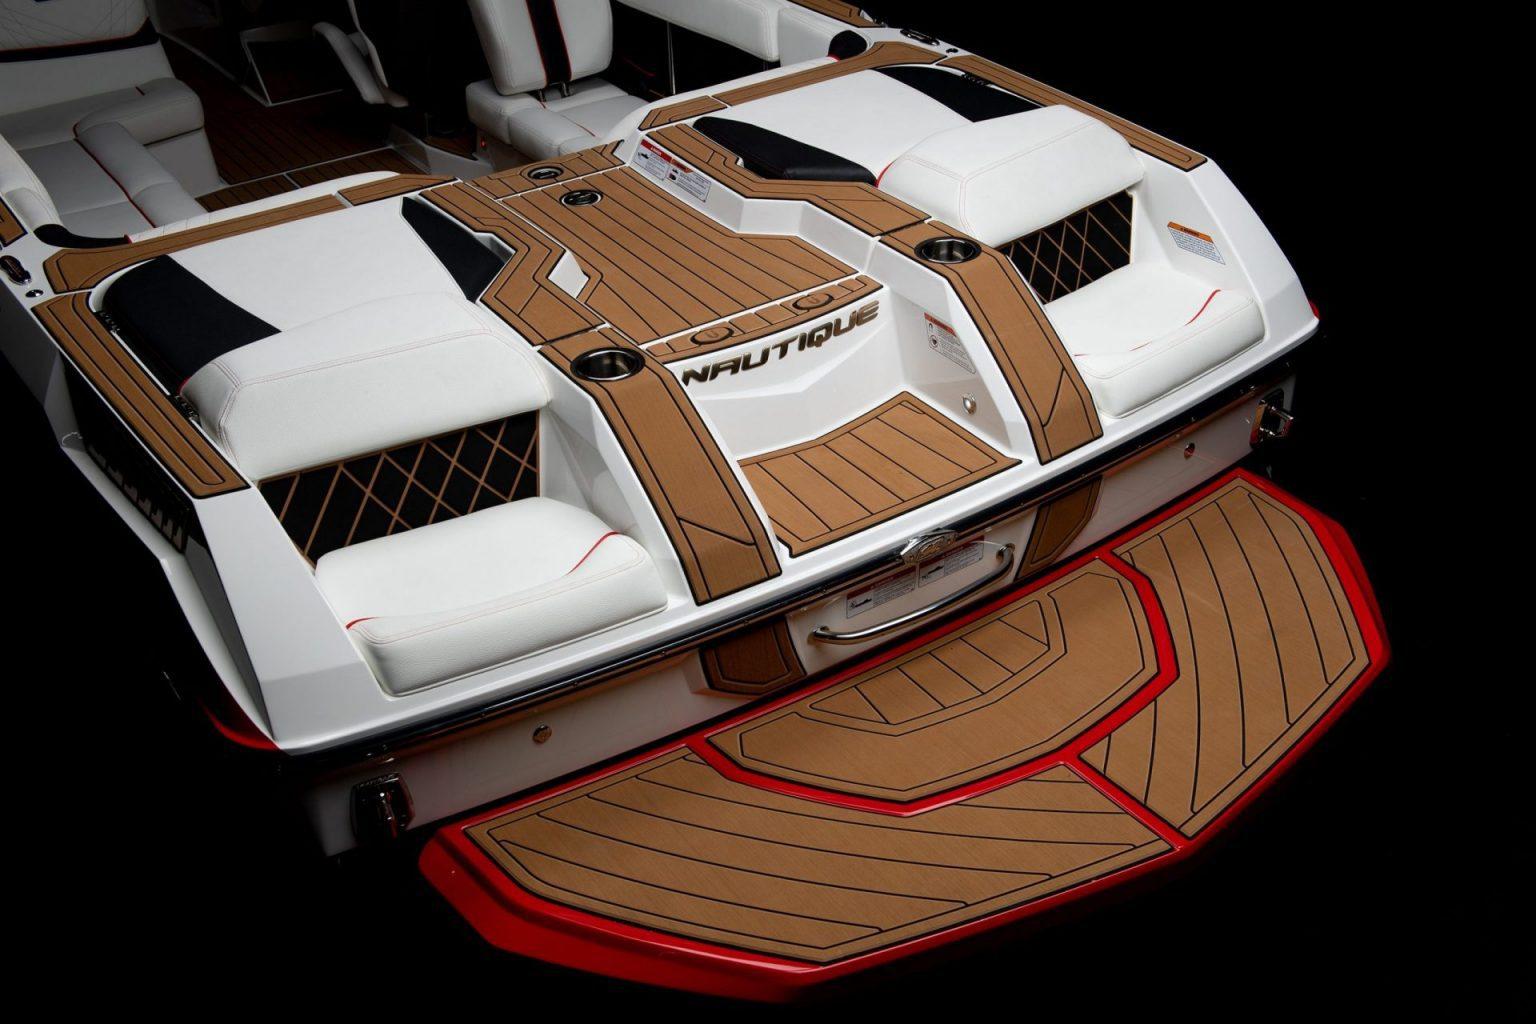 סירת ספורט וויקסרף וויקבורד וסקי NAUTIQUE GS22 - סטרים יאכטות